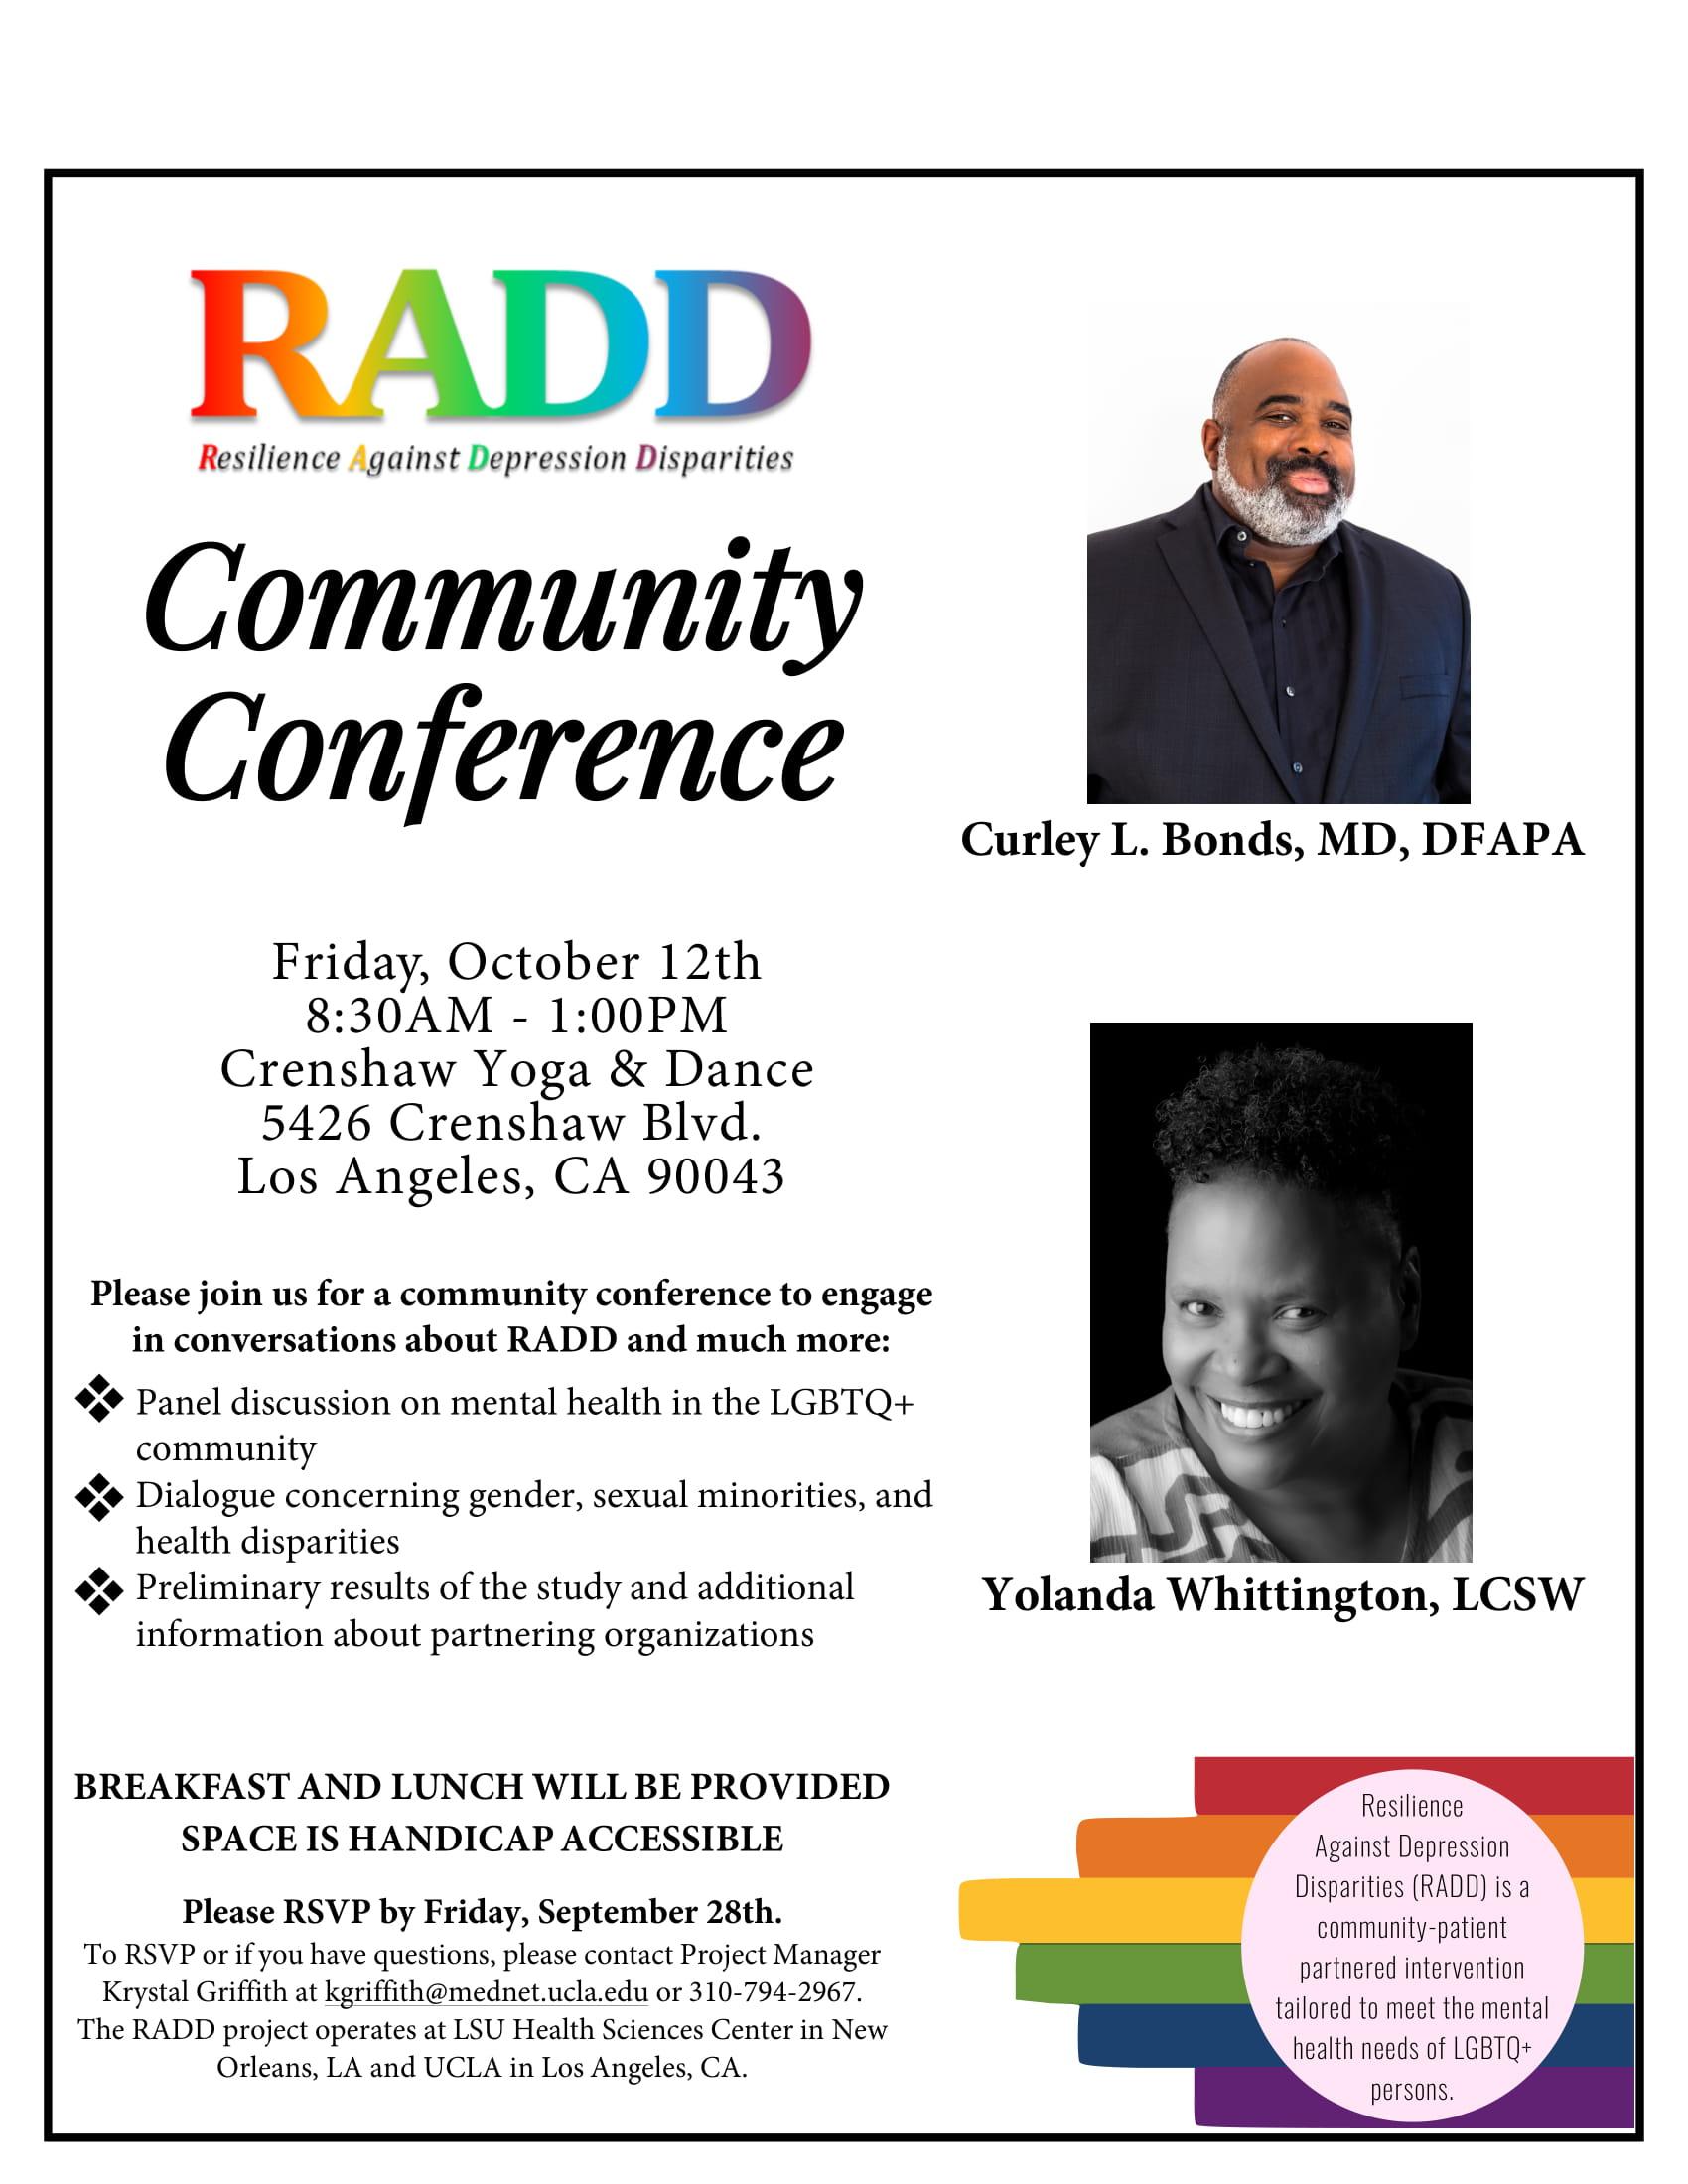 RADD_Community Conference Flyer - Los Angeles 9.12.18-1.jpg